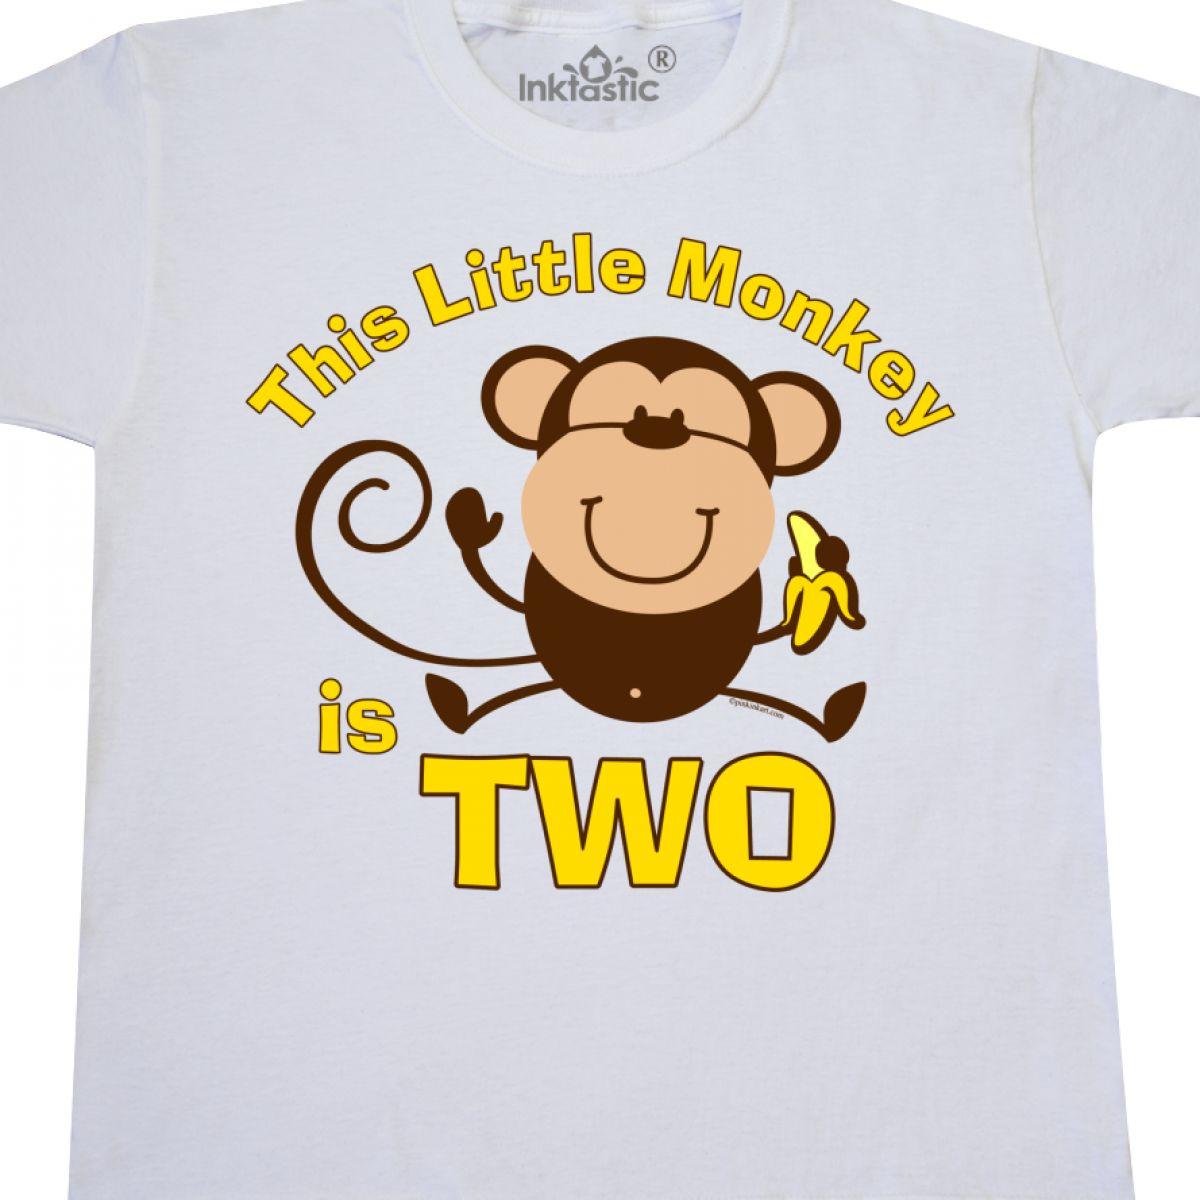 Inktastic Little Monkey 2nd Birthday Boy Youth T